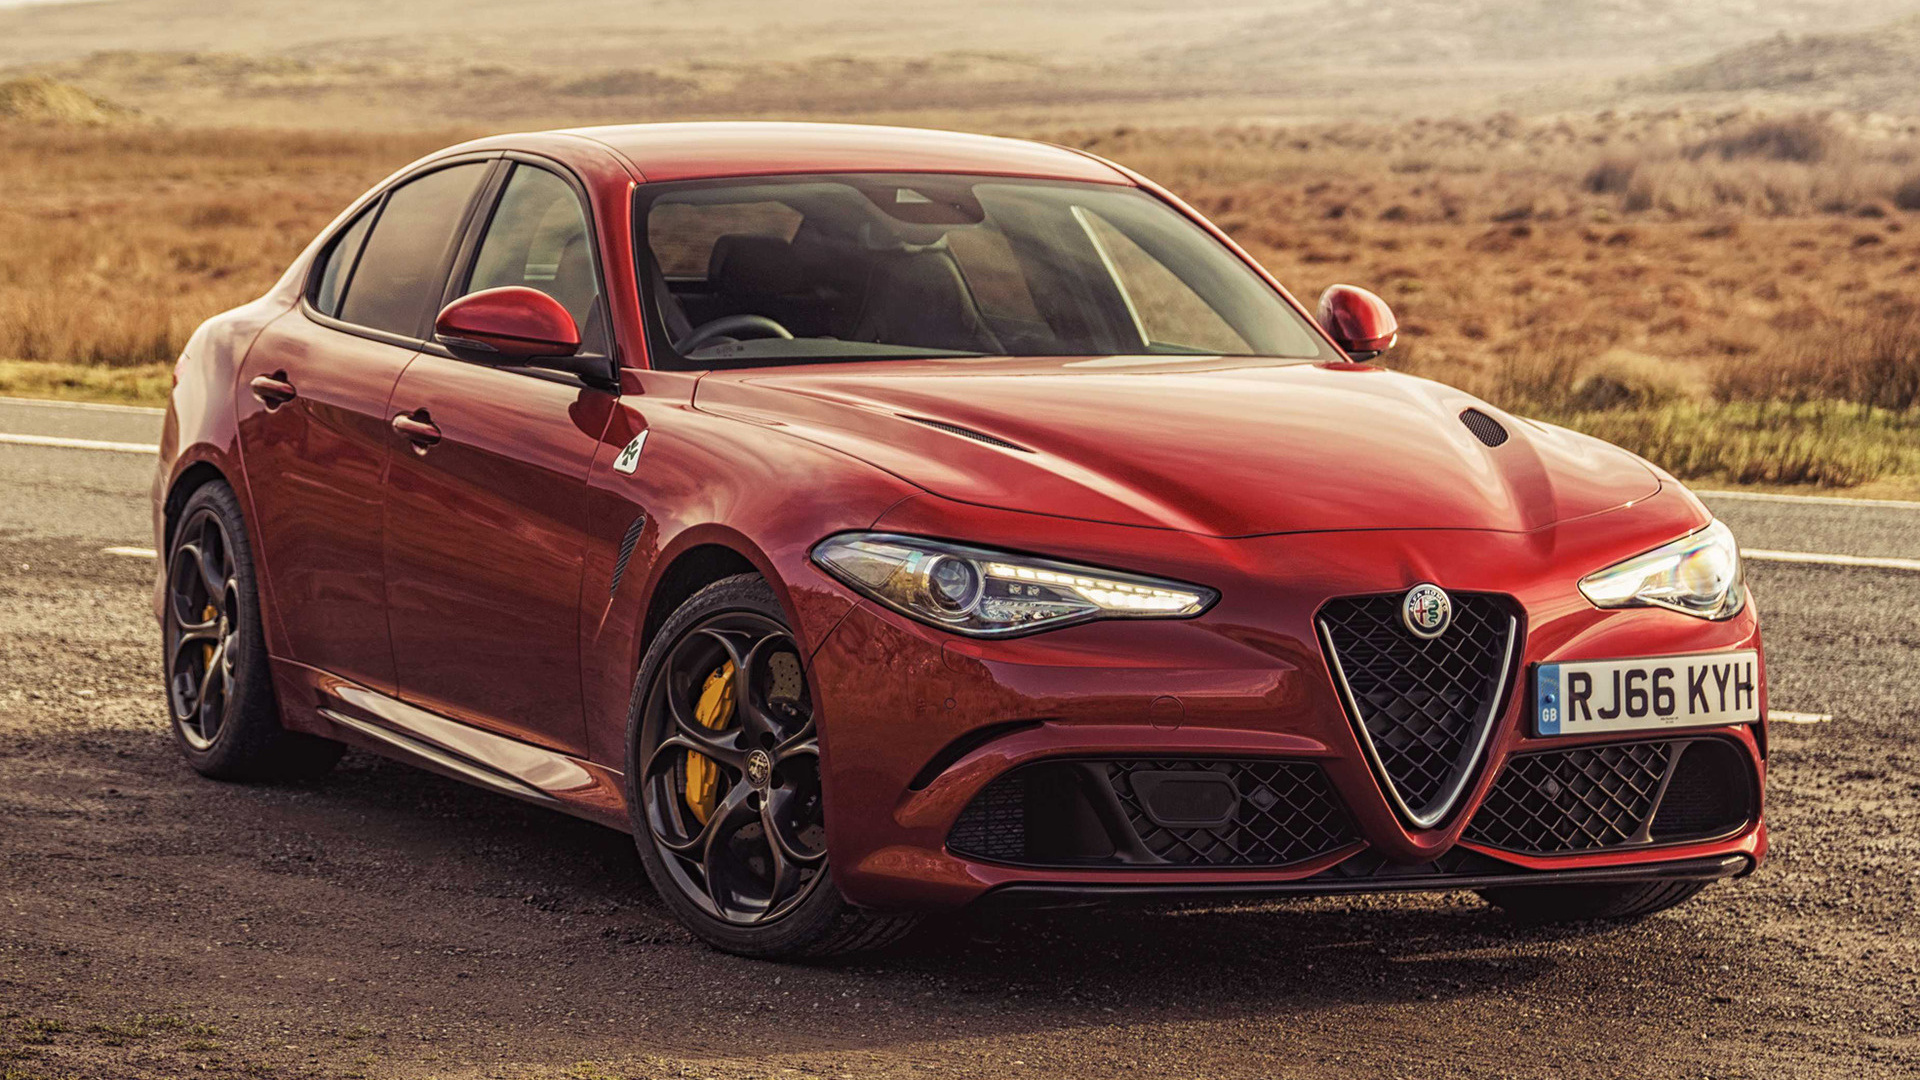 2016 Alfa Romeo Giulia Quadrifoglio Uk Wallpapers And Hd